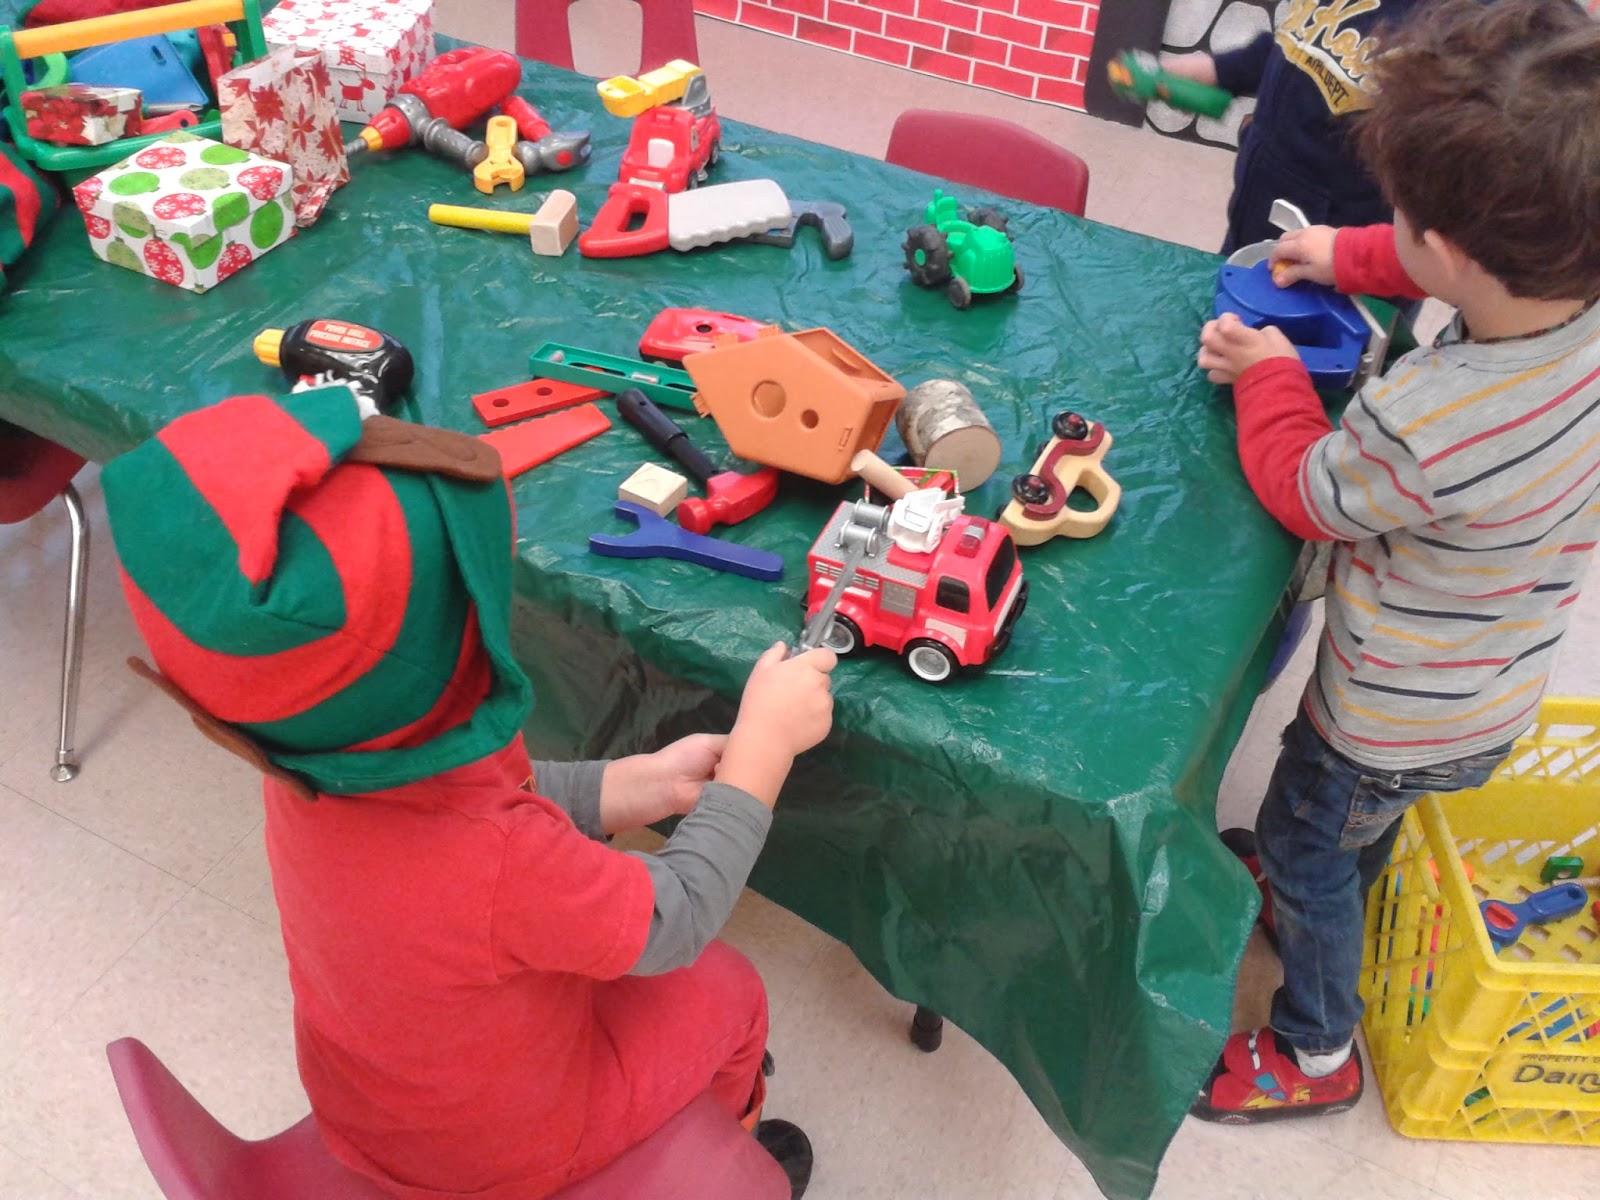 Christmas Toy Ideas : Teach easy resources santa s toy shop in preschool